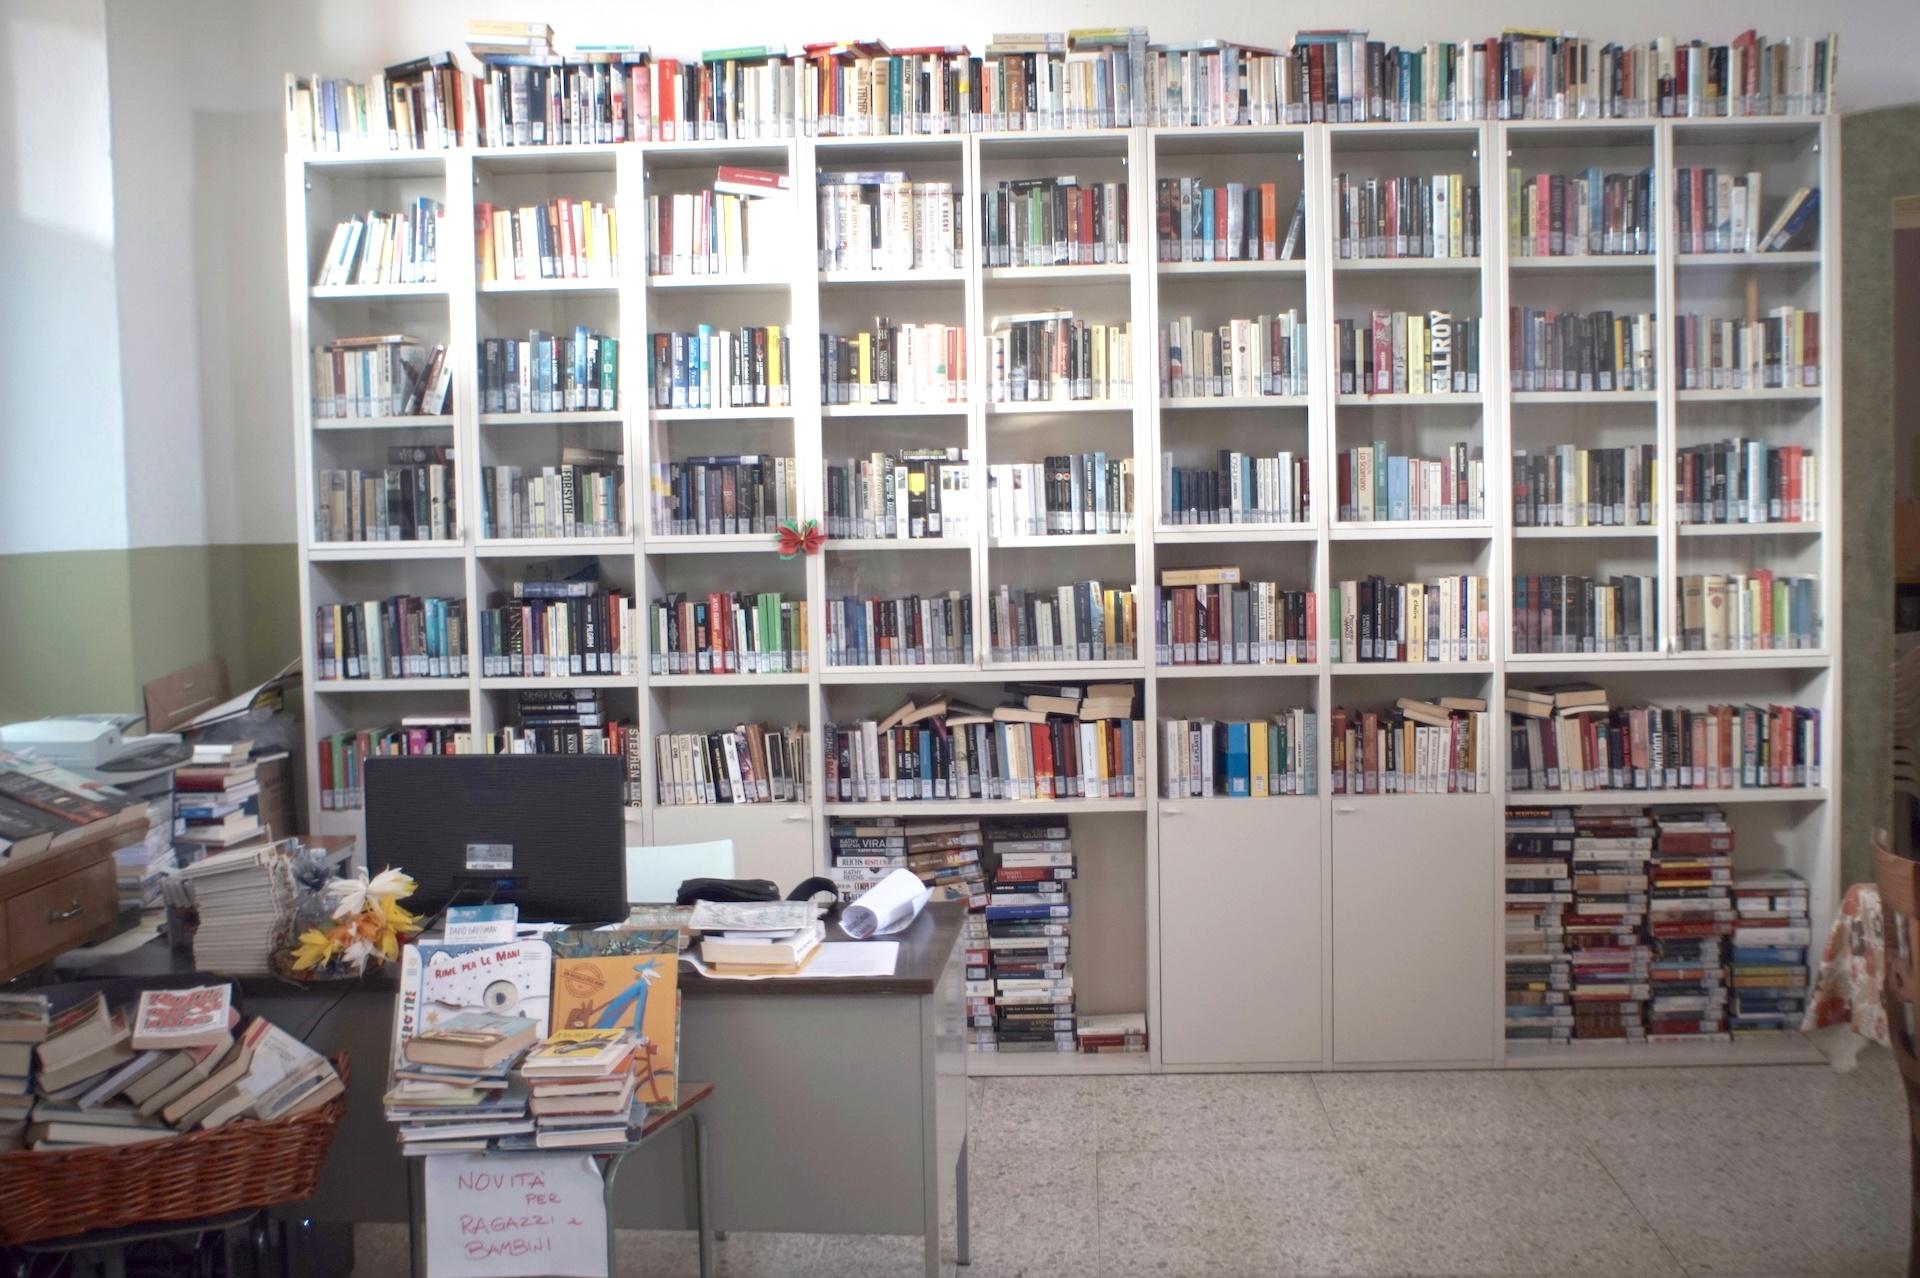 Biblioteca di Casalnoceto